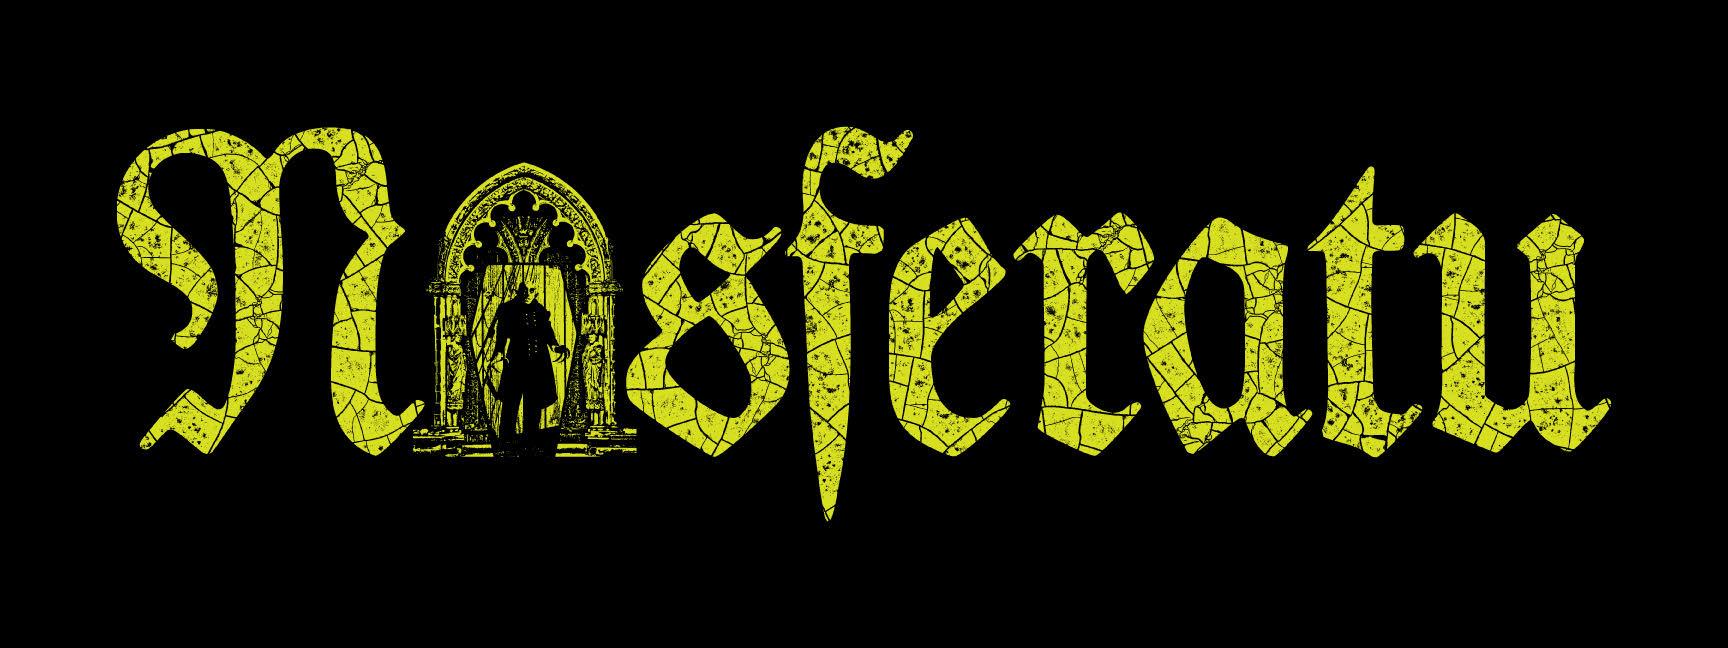 Nosferatu -Castle Glow